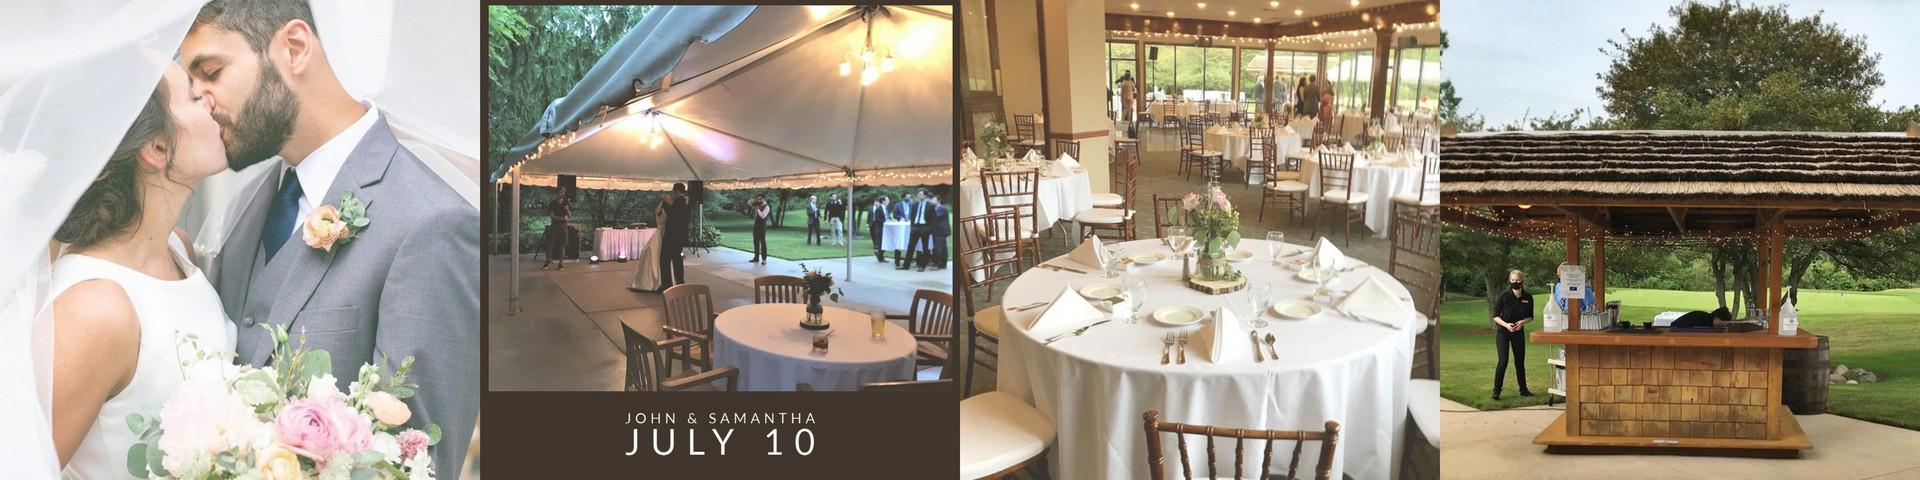 golf course wedding reception